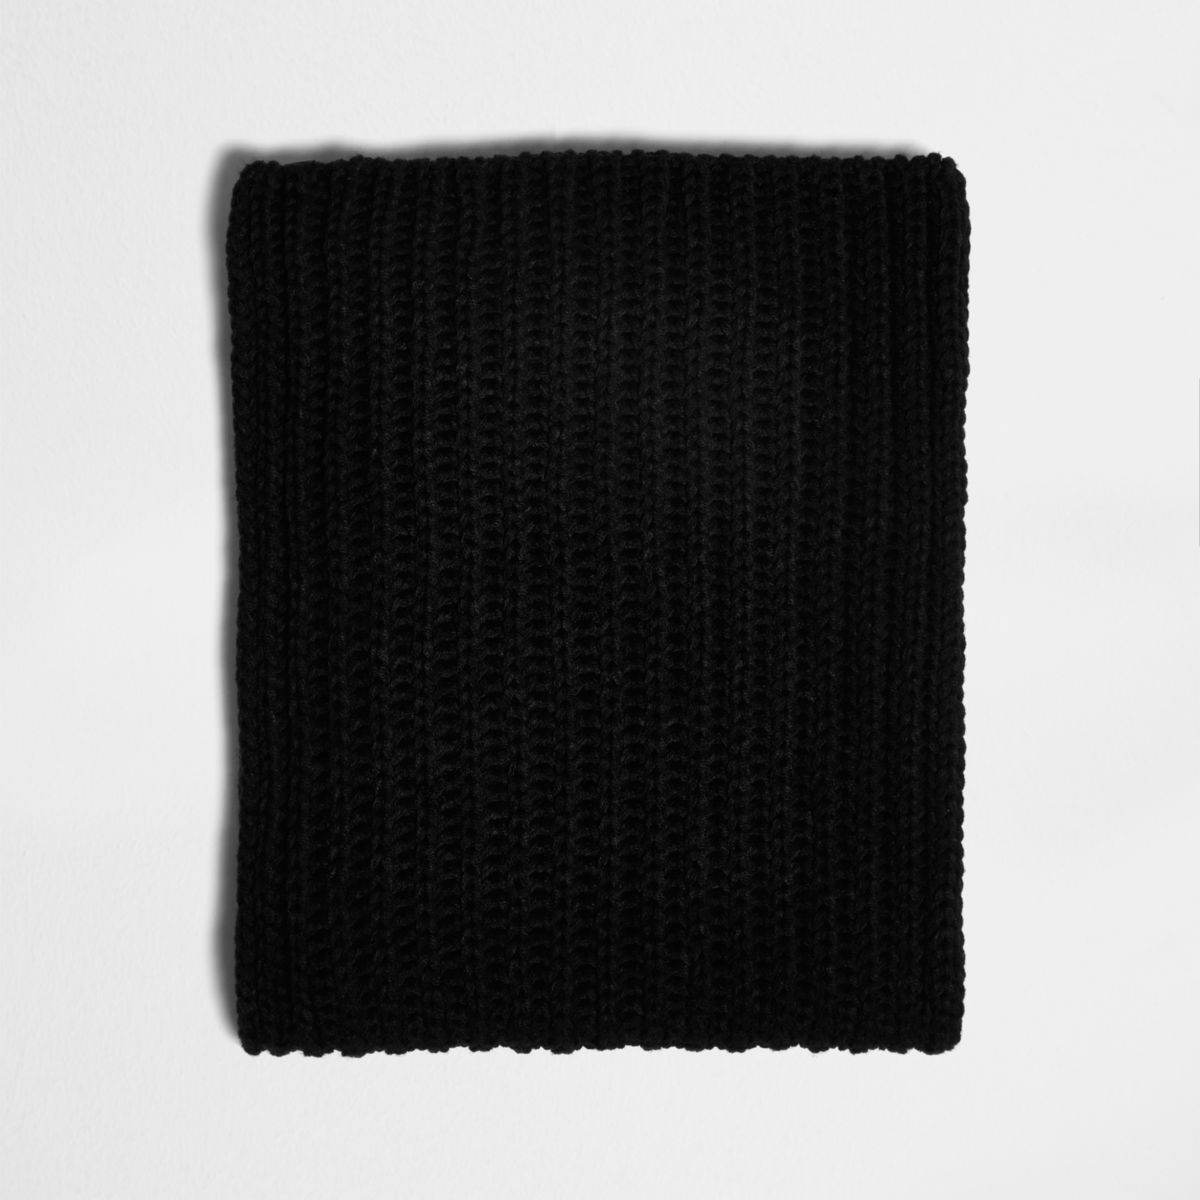 Black chunky rib knit fabric